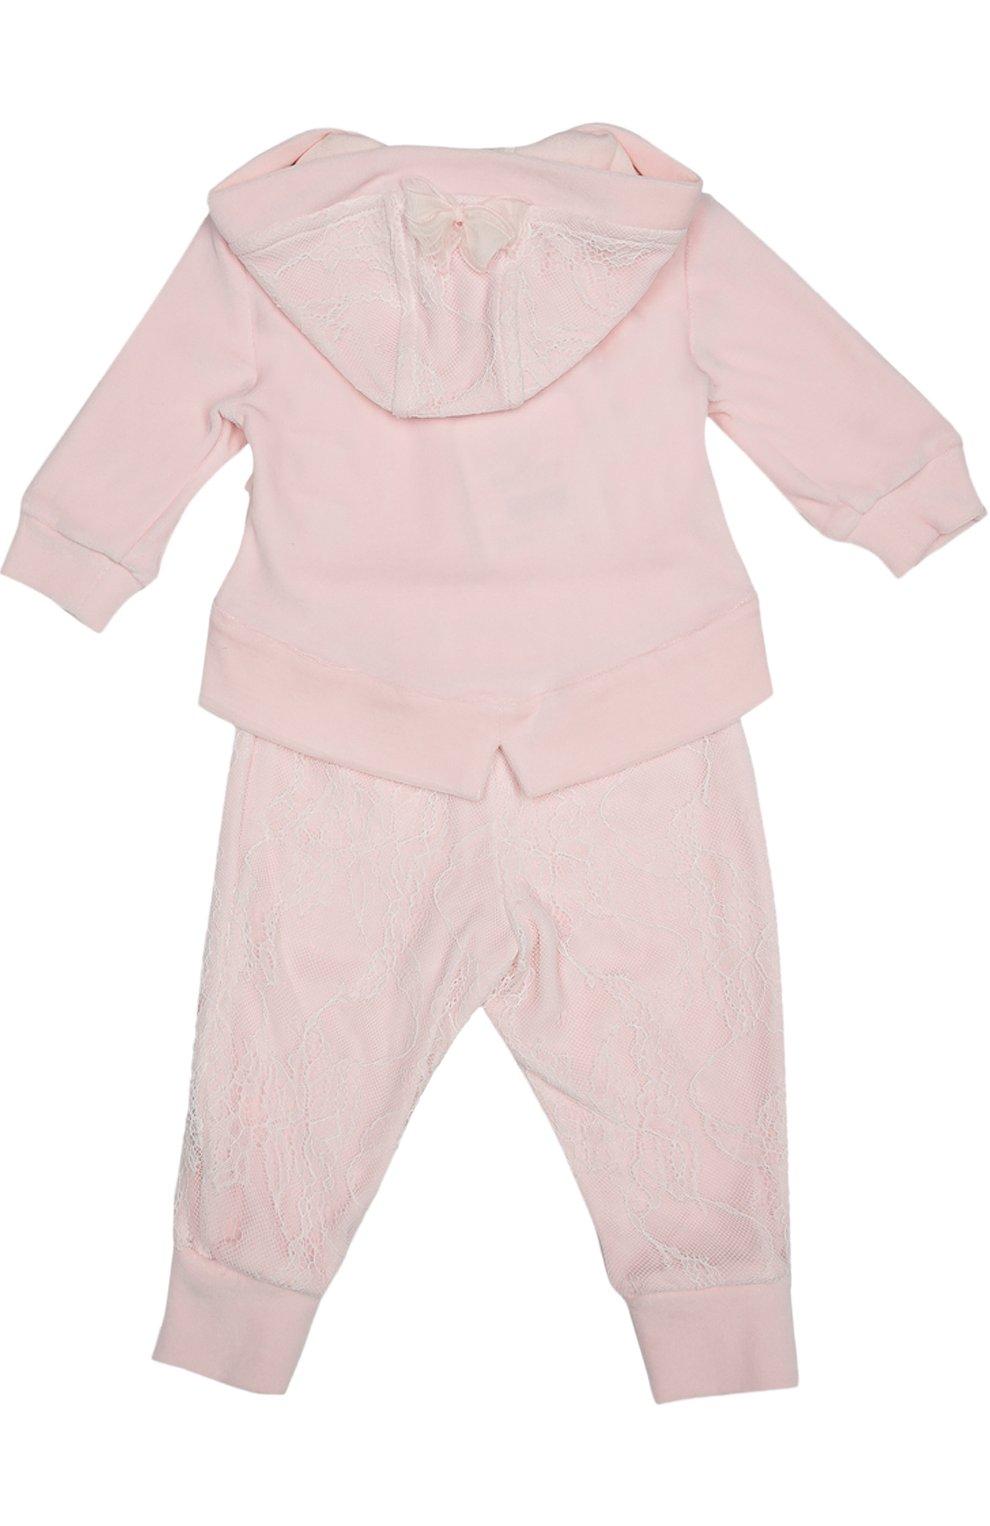 Детский костюм спортивный с футболкой  ALETTA розового цвета, арт. RP666112CIN/1M-18M | Фото 2